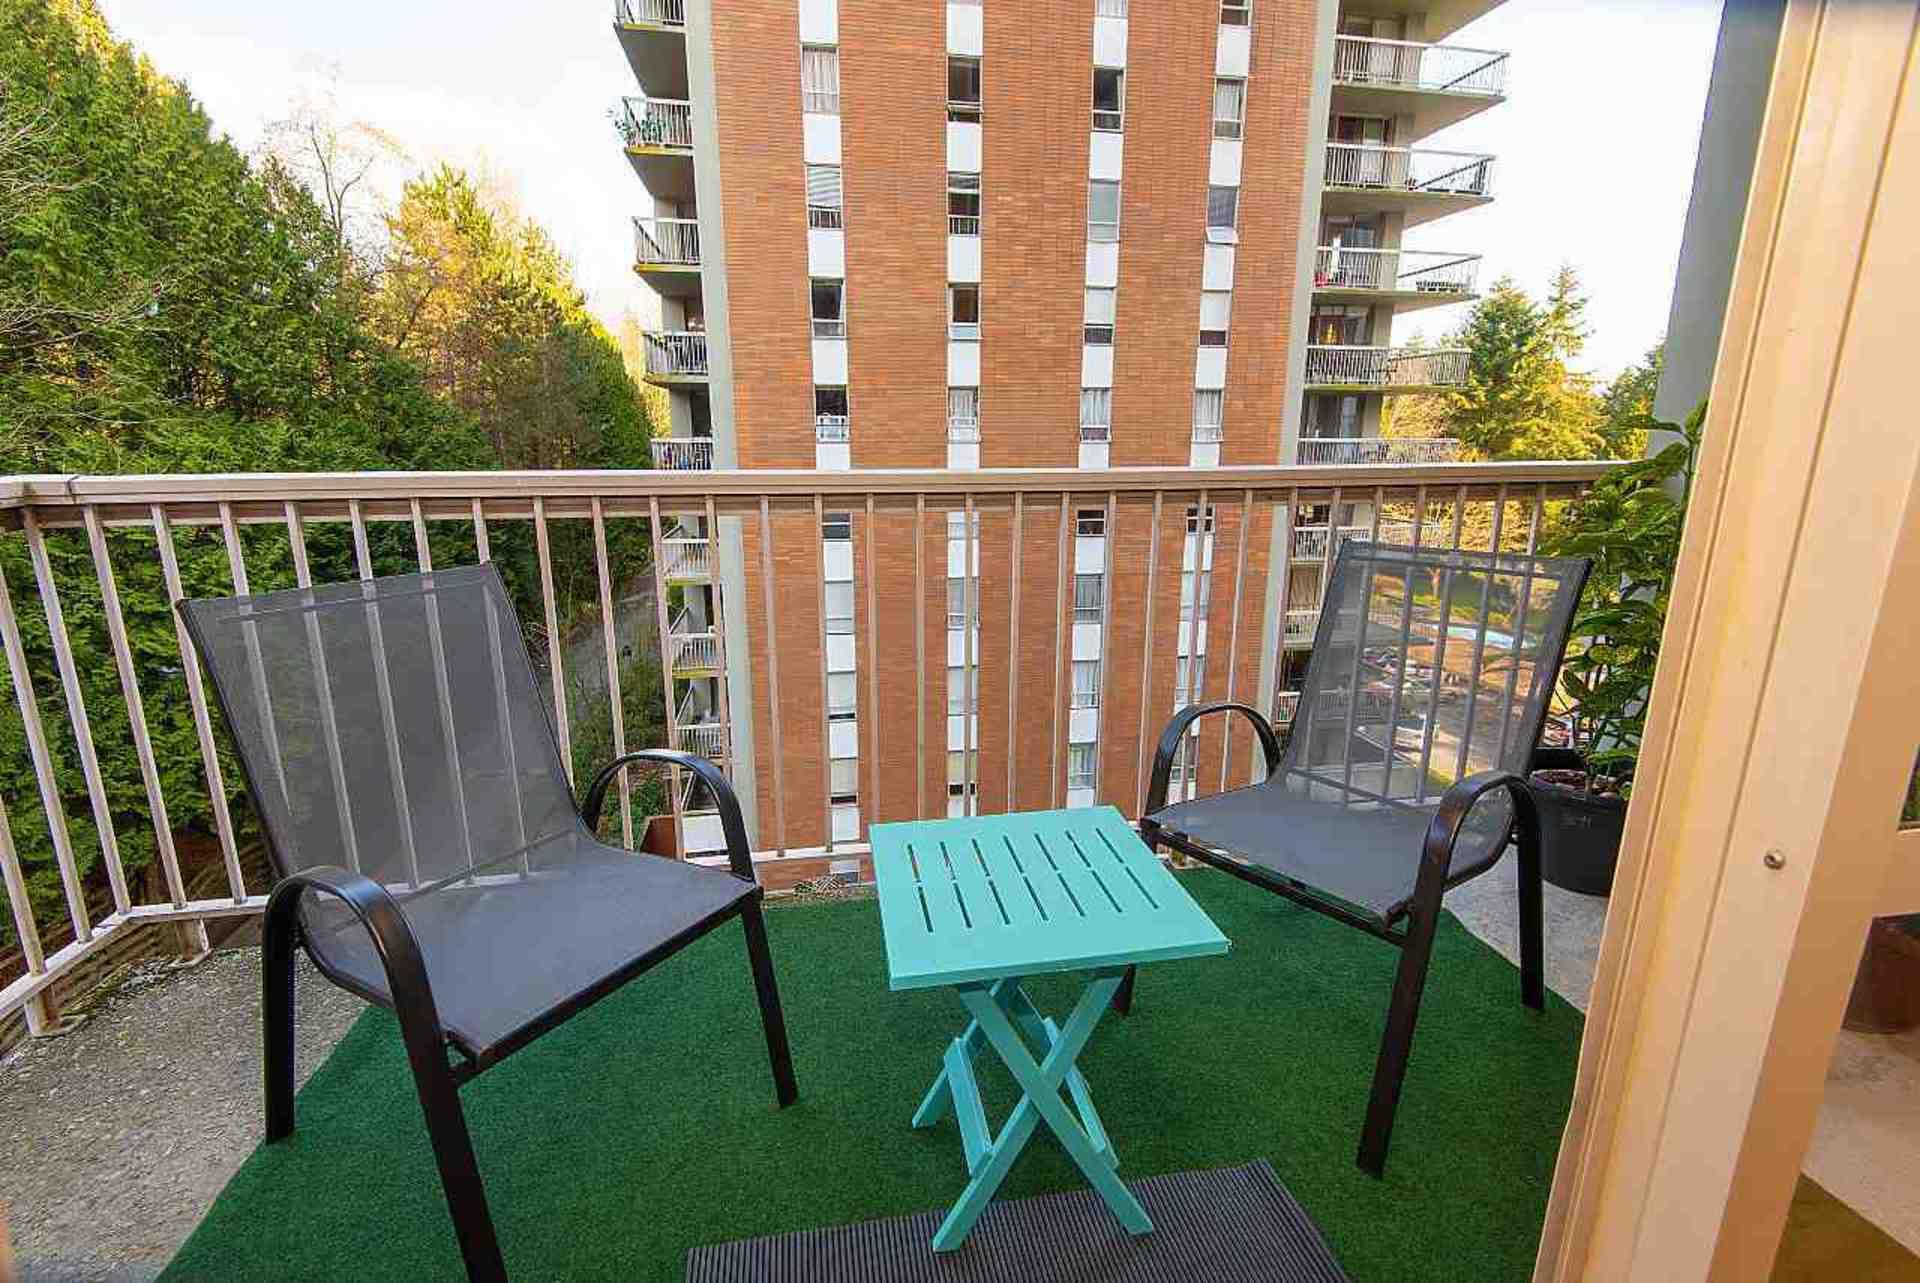 2016-fullerton-avenue-pemberton-nv-north-vancouver-12 at 604 - 2016 Fullerton Avenue, Pemberton NV, North Vancouver